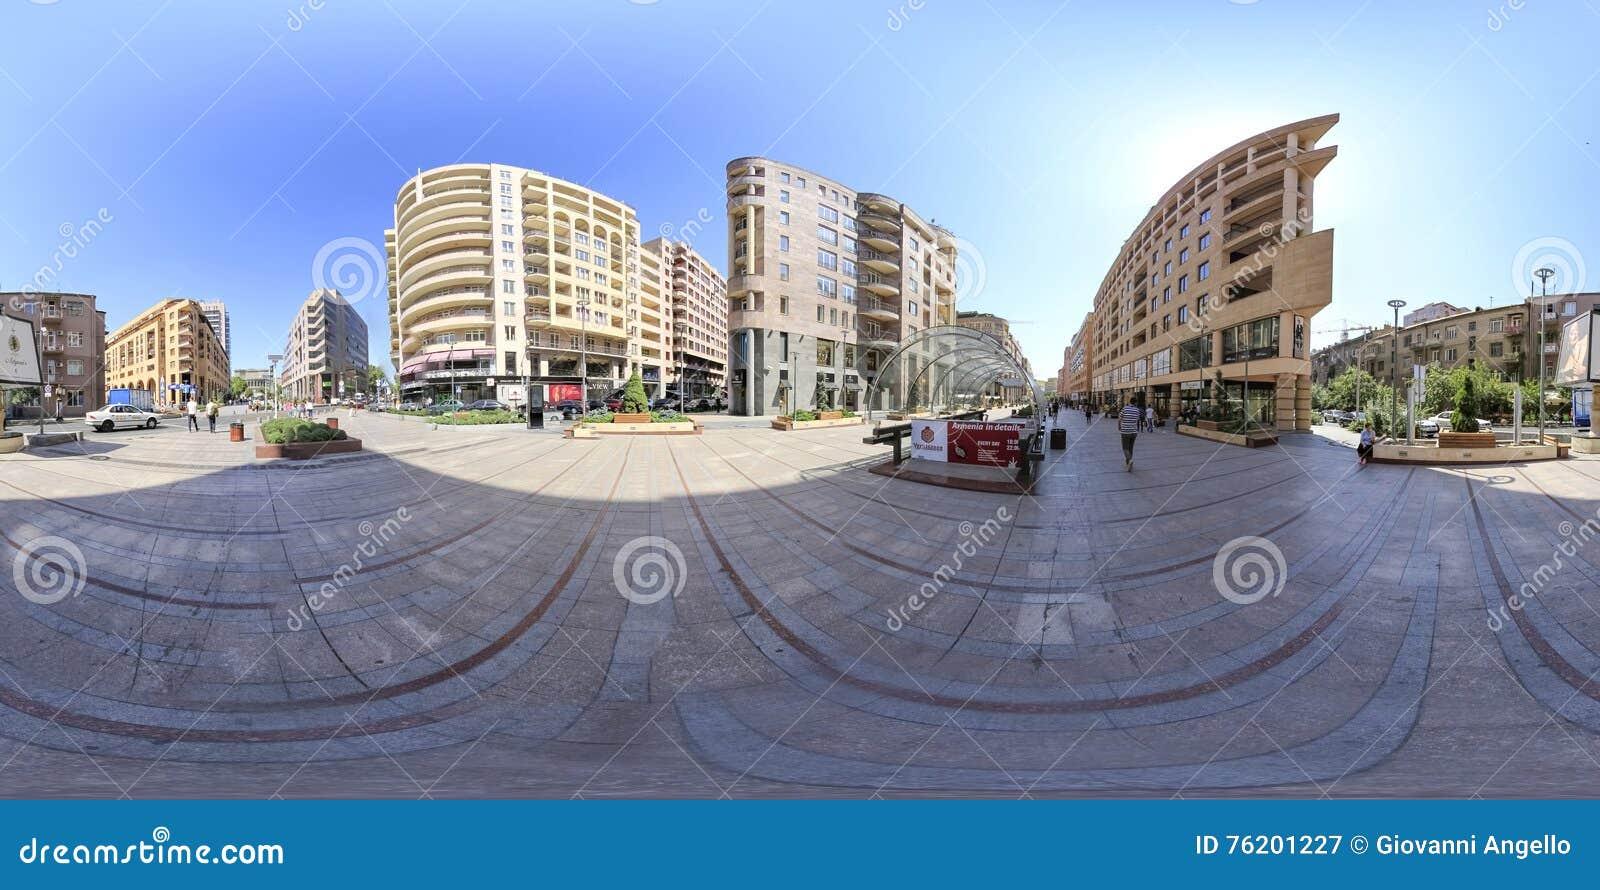 Yerevan 360 Degree Virtual Reality Photo Editorial Photography